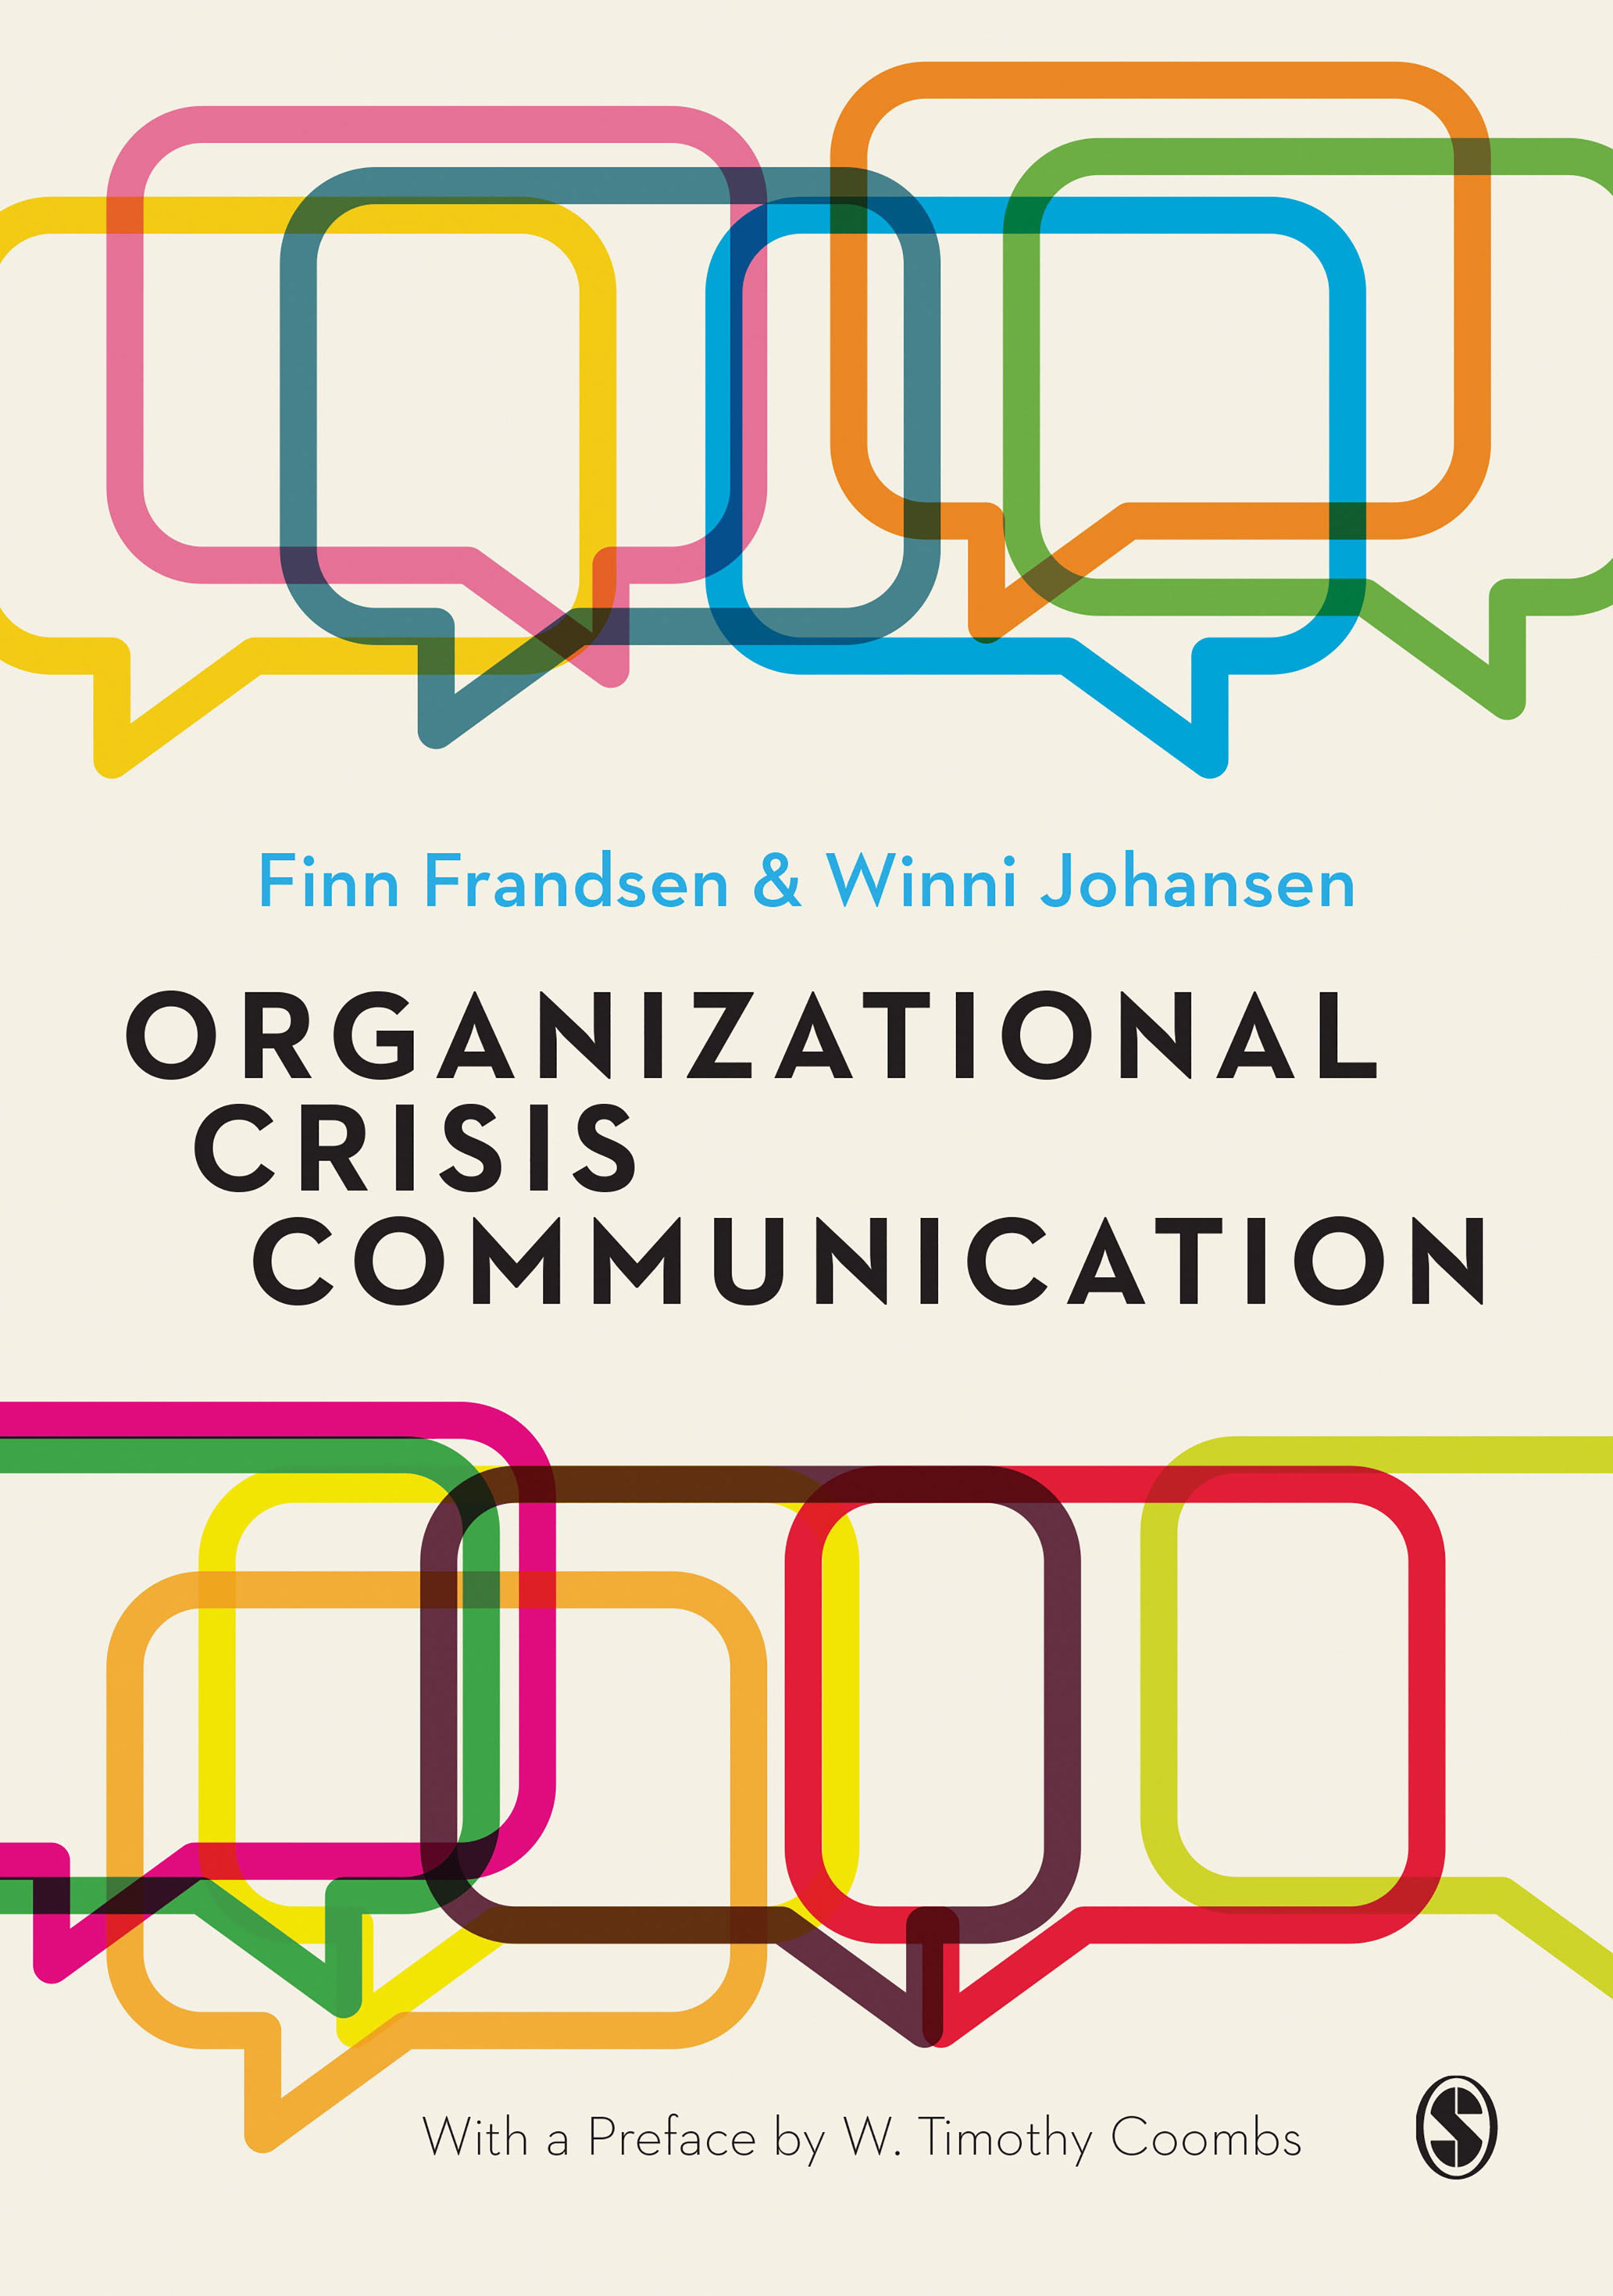 Download Ebook Organizational Crisis Communication by Finn Frandsen Pdf